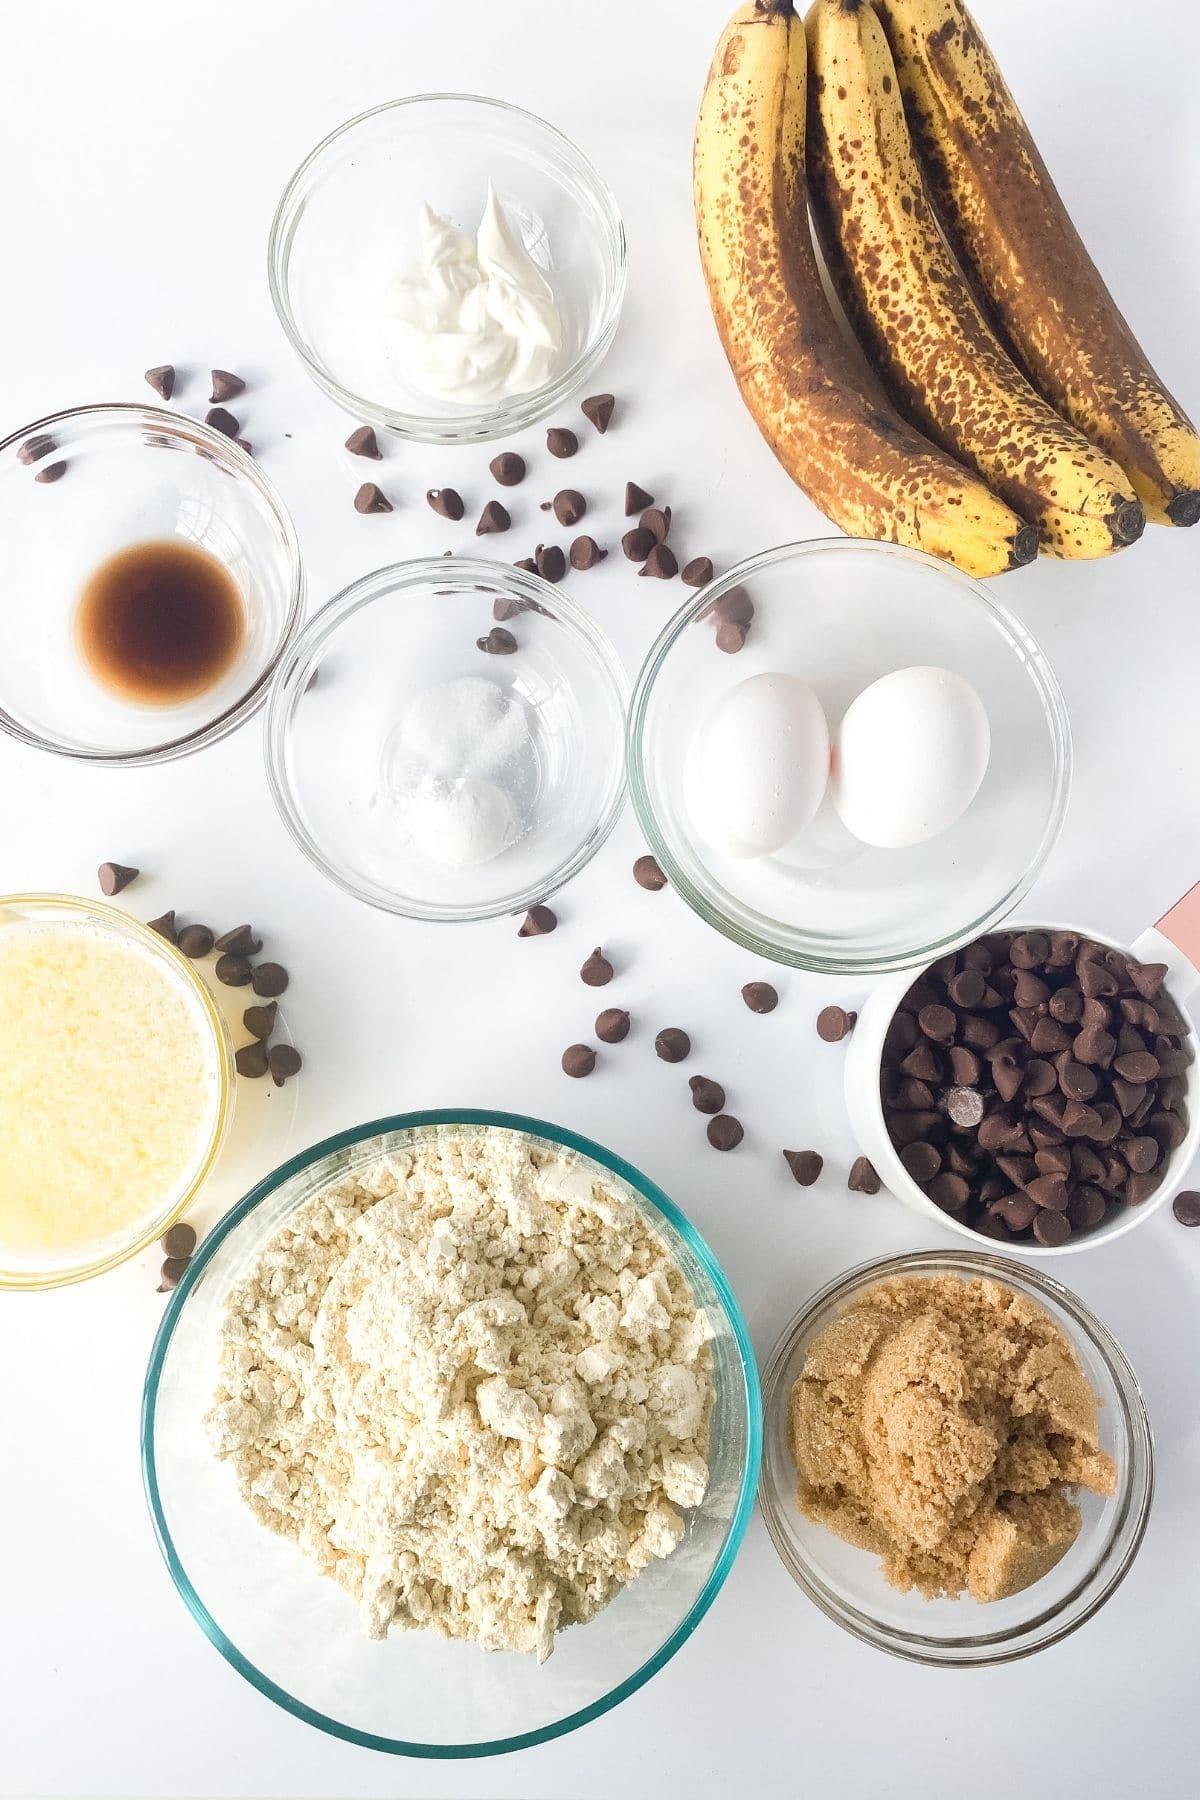 Ingredients for gluten free banana muffins